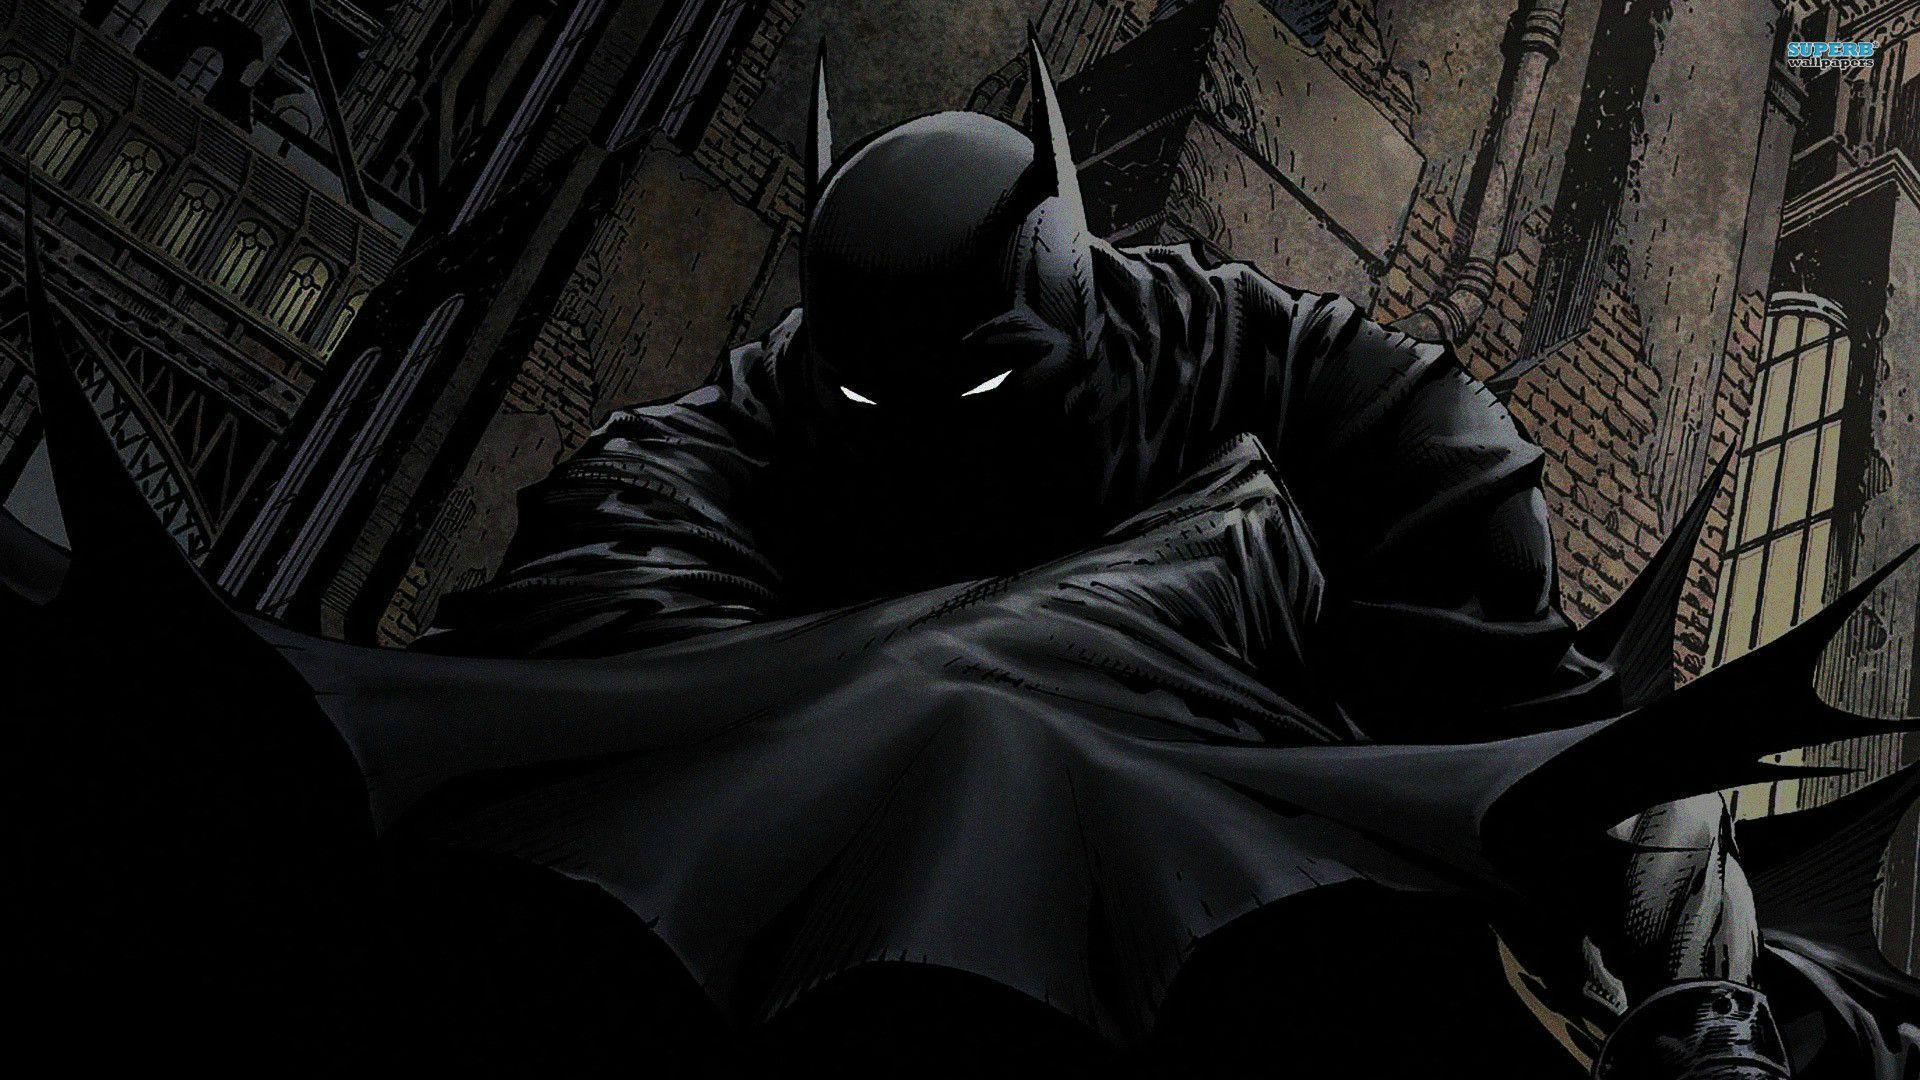 batman dark wallpaper-#31